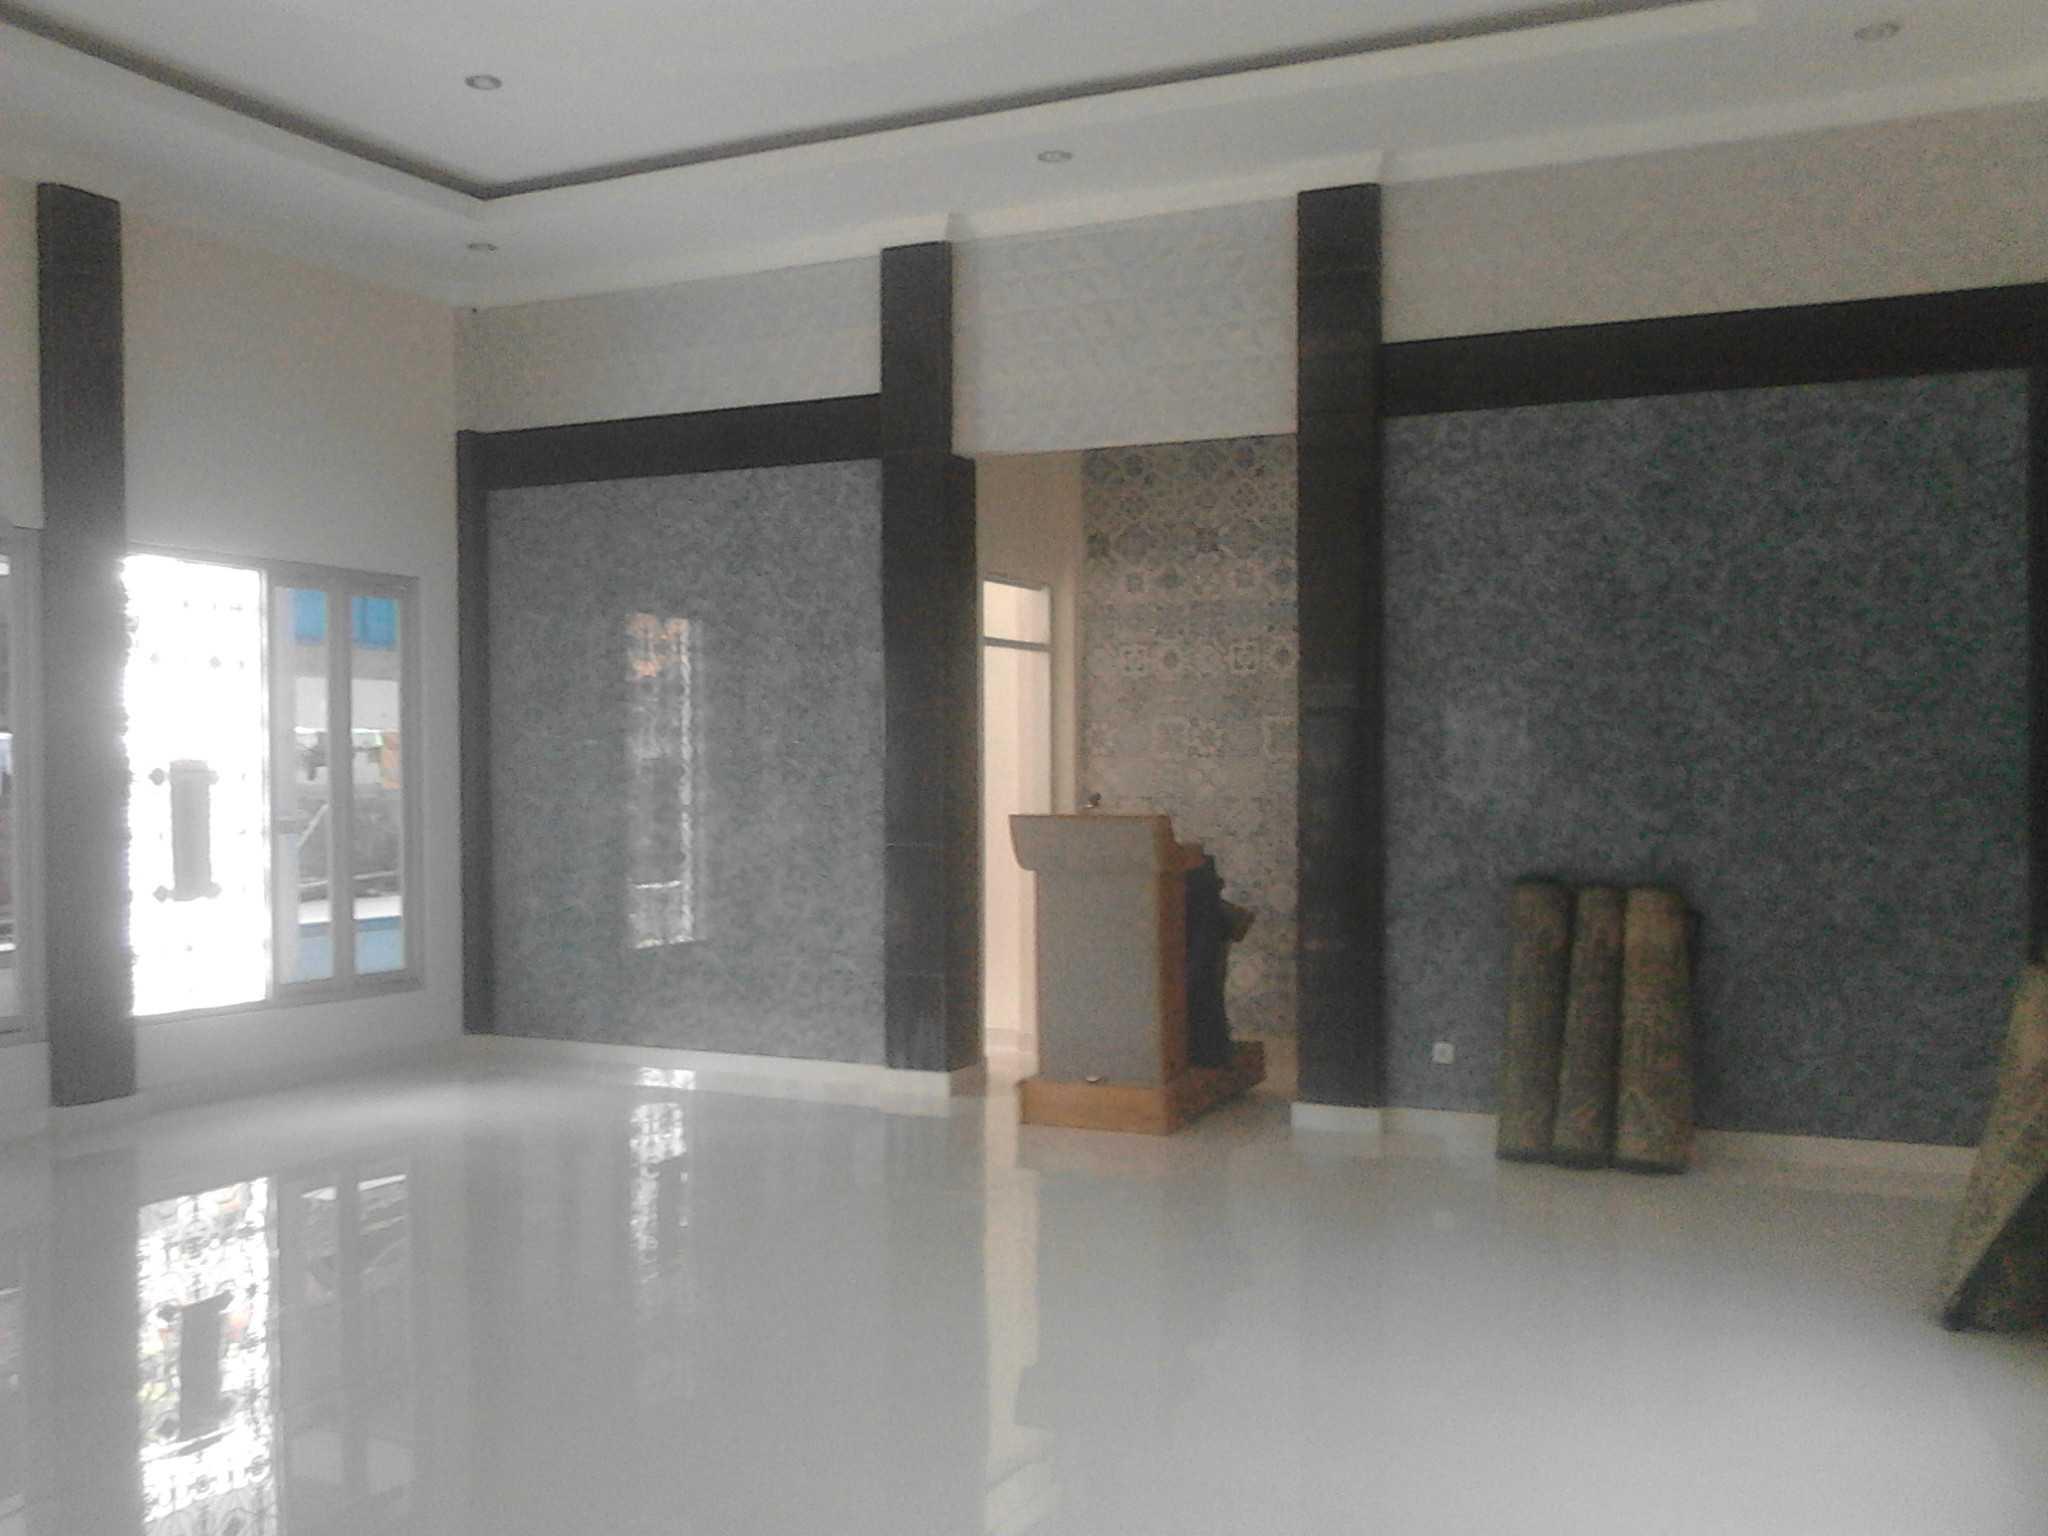 Archdesignbuild7 Mesjid Nasrullah  Soreang, West Java Soreang, West Java Img20170109103259 Modern  20781